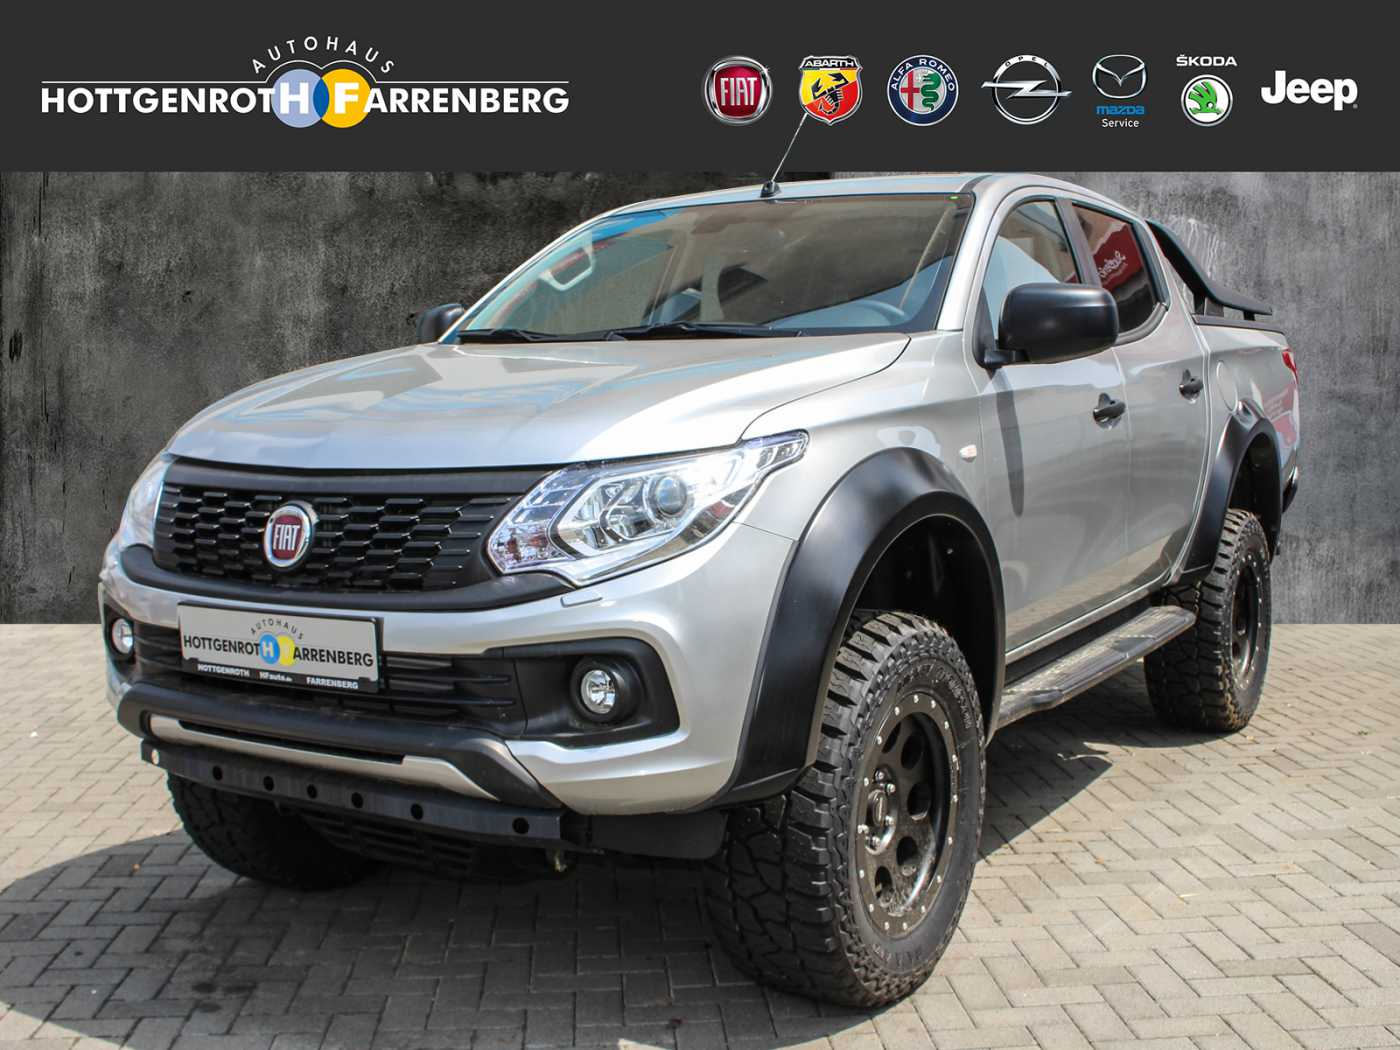 Fiat Fullback CROSS HF-UMBAU 5AT- Automatik 4WD E6 3,5 ' Fahrwerk/ Bügel / Leder/Navi/Kam./AHK, Jahr 2018, Diesel